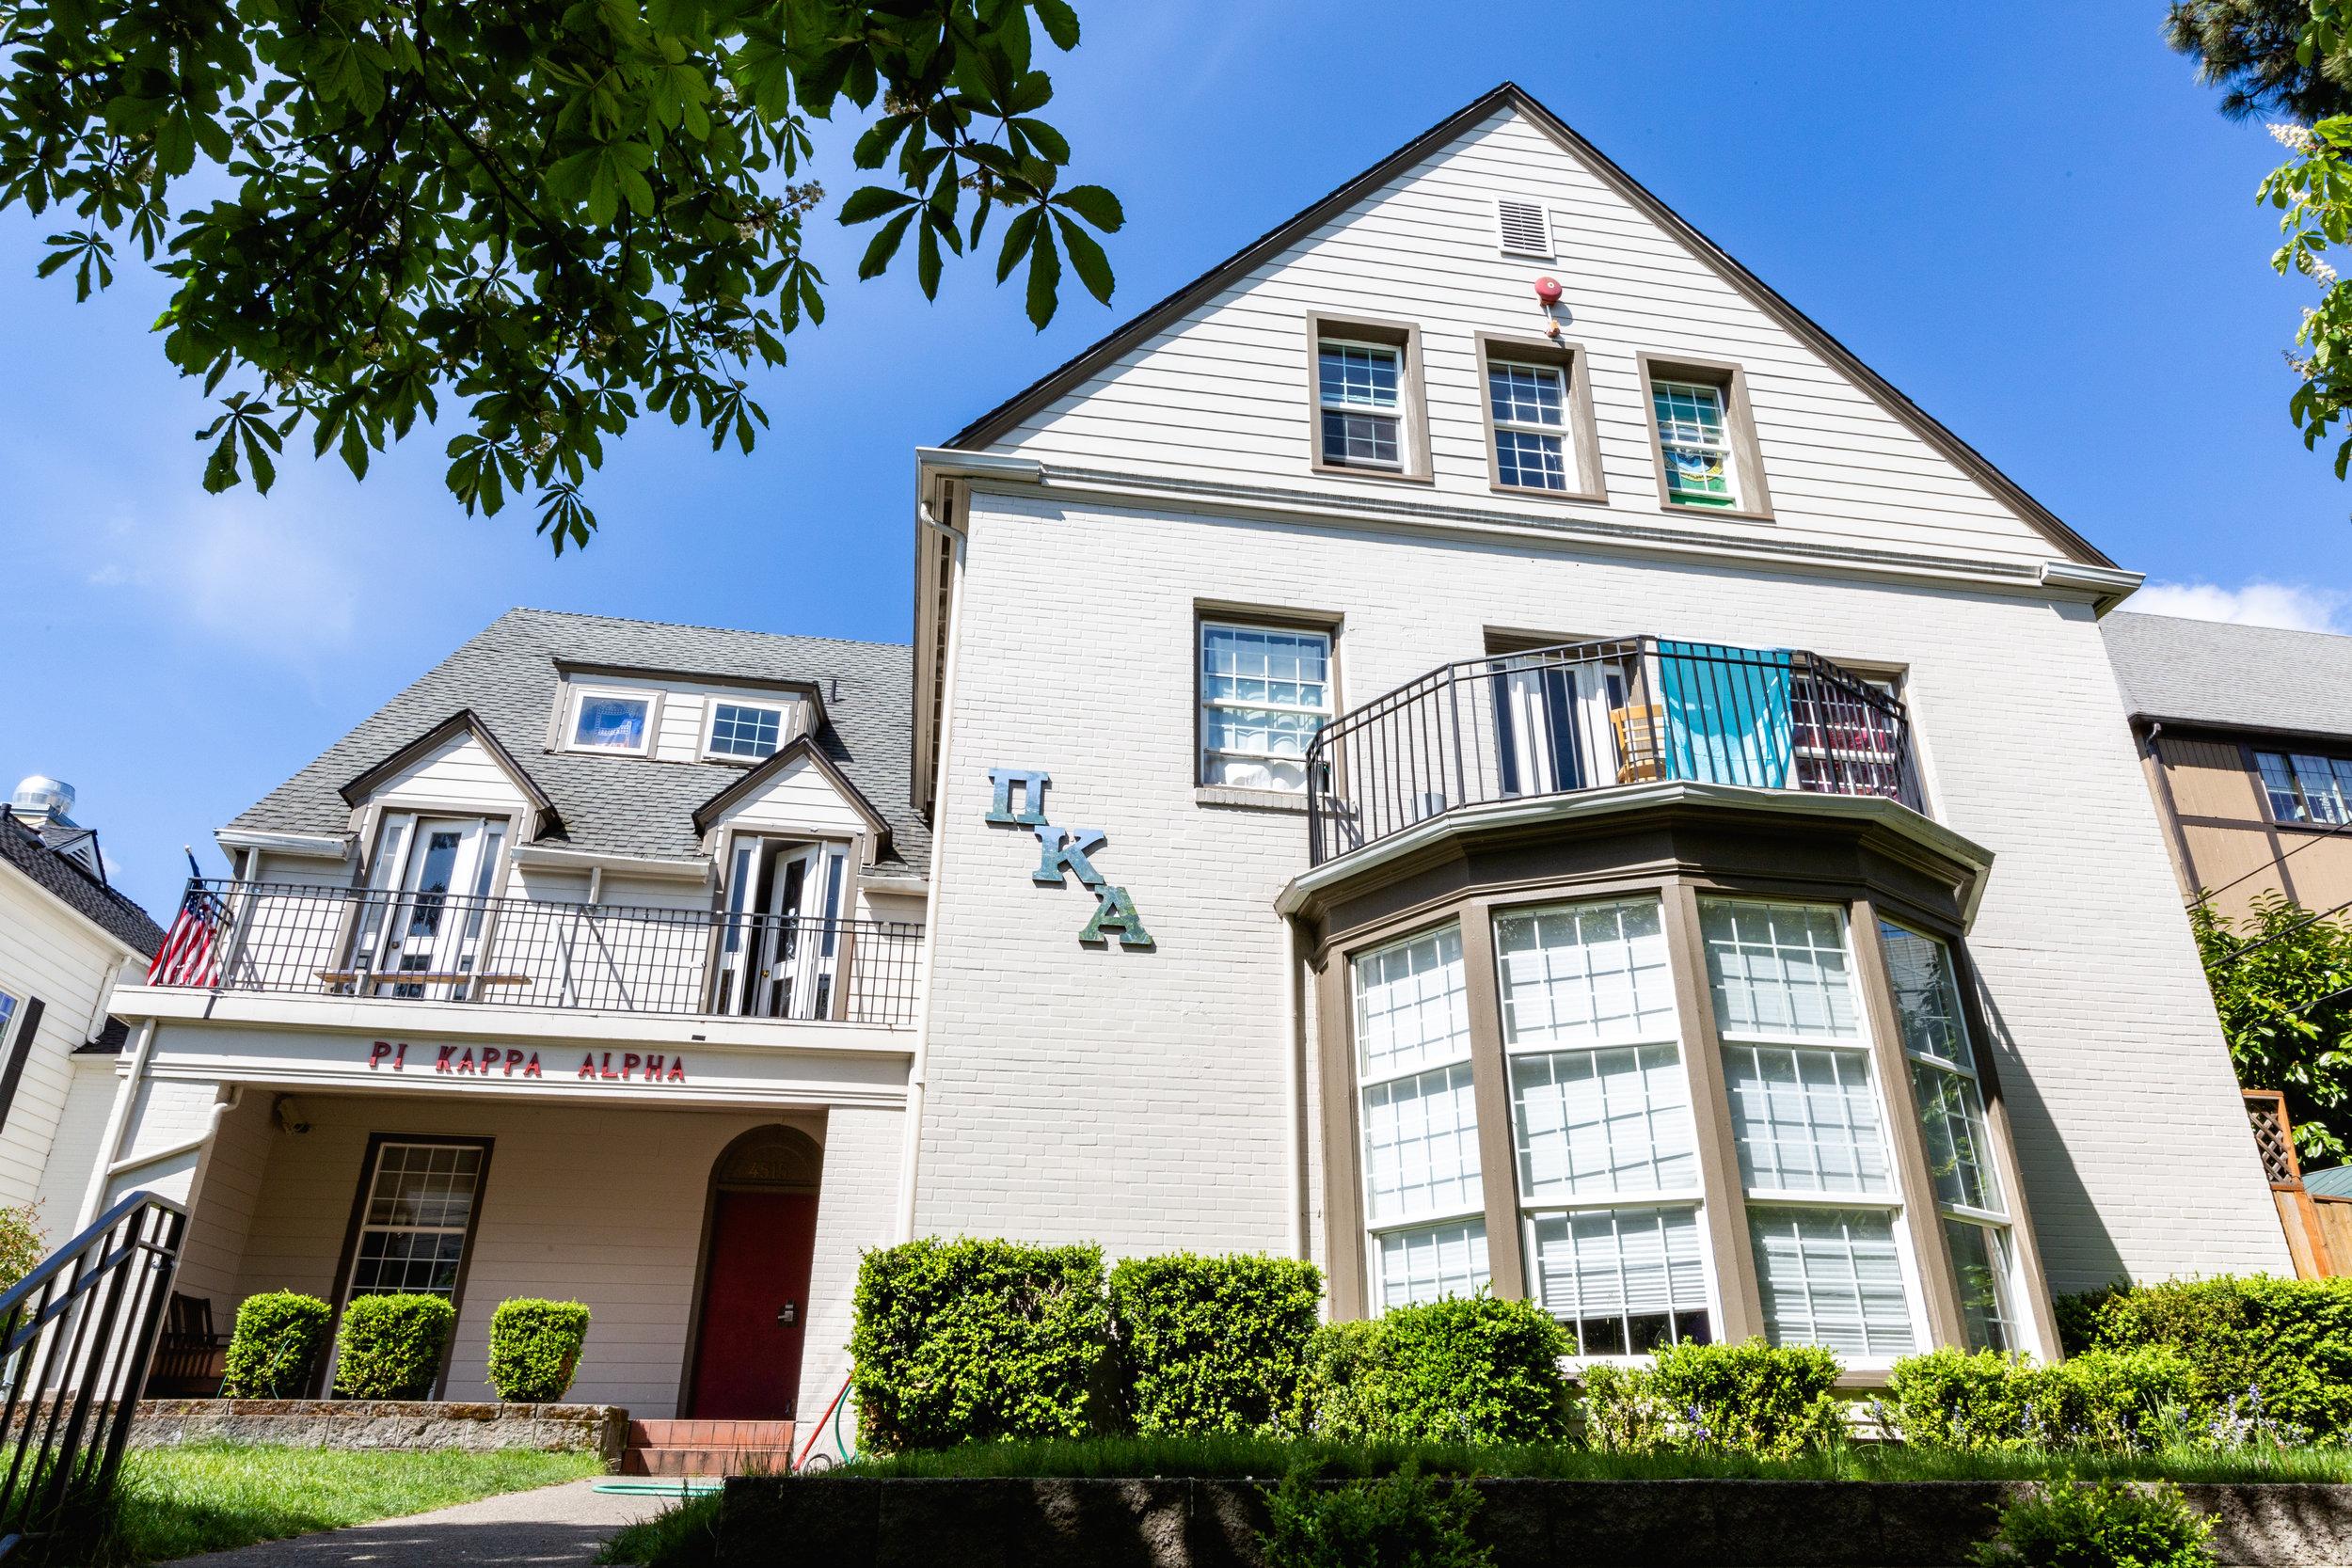 Pike house 1.jpg